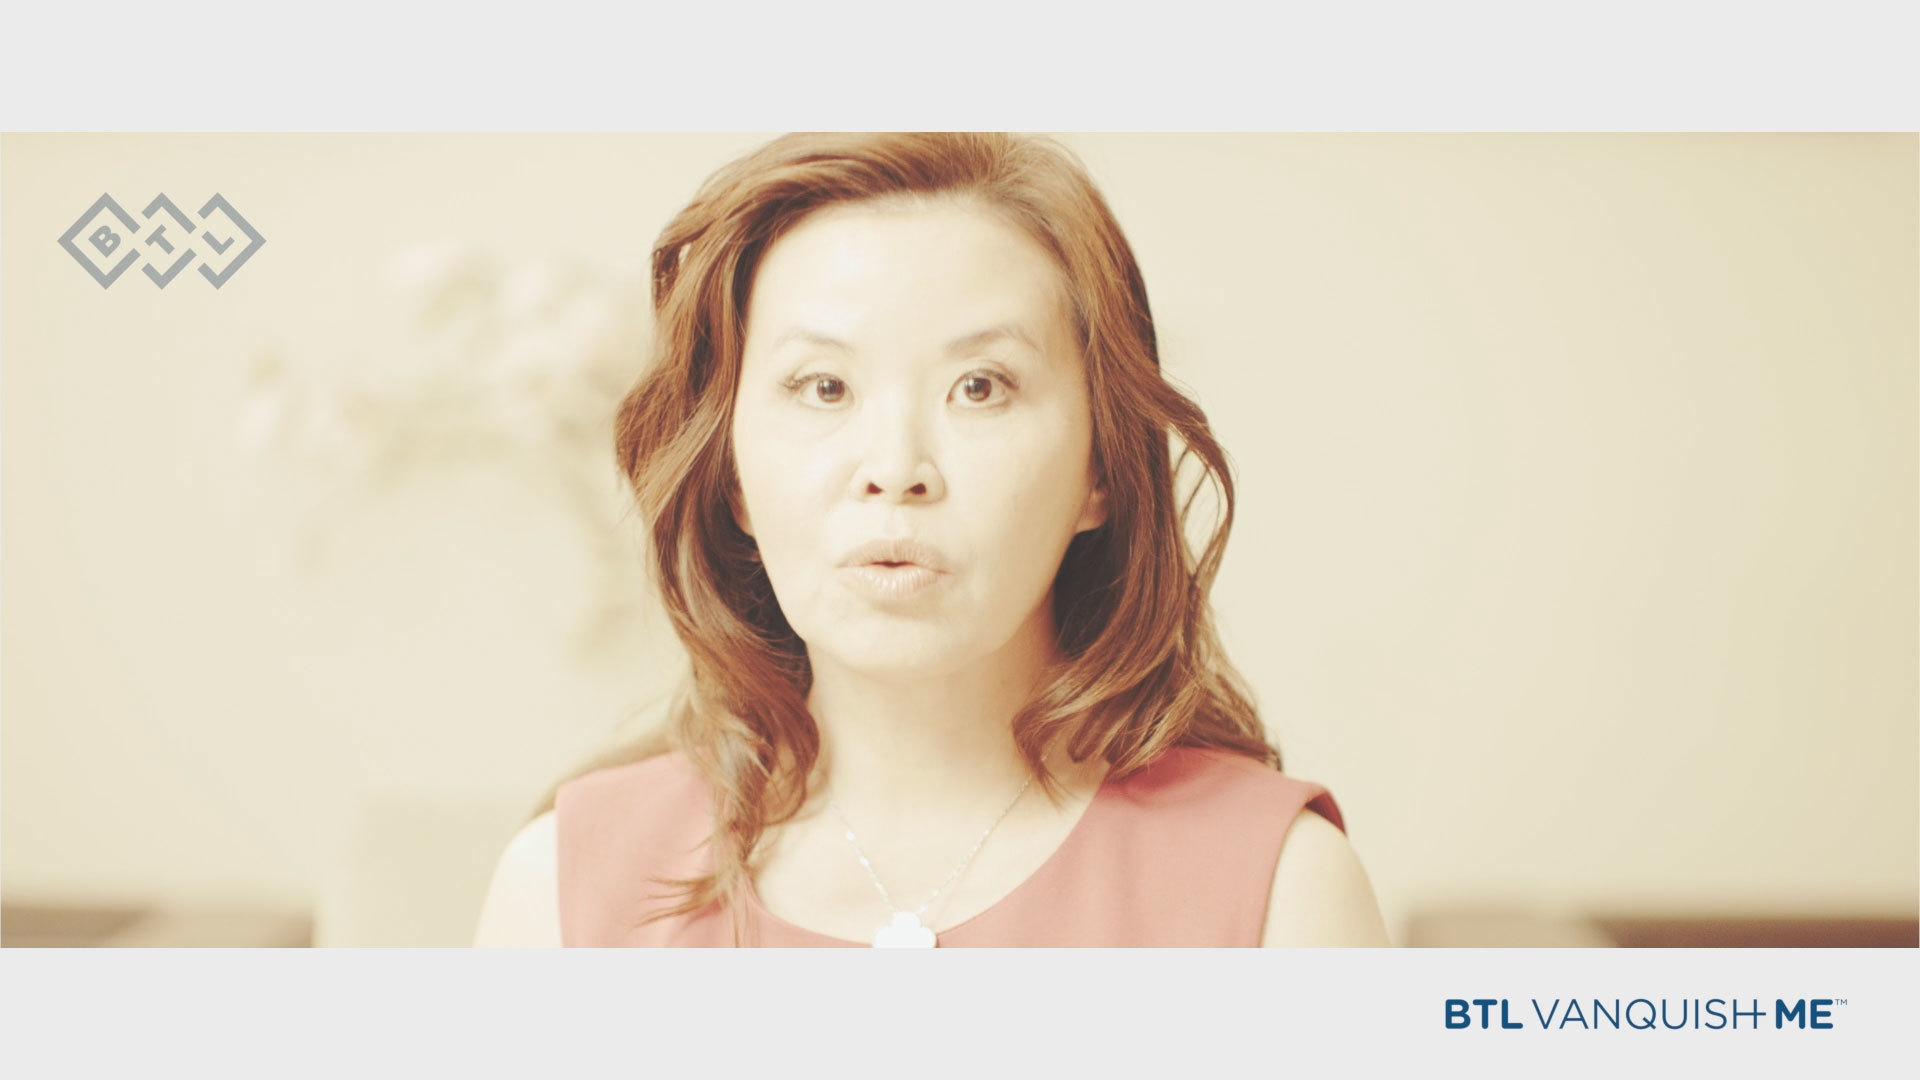 BTL_Vanquish_ME_VIDEO_Liu-Webinar-Draft-2_1080p_ENUS300